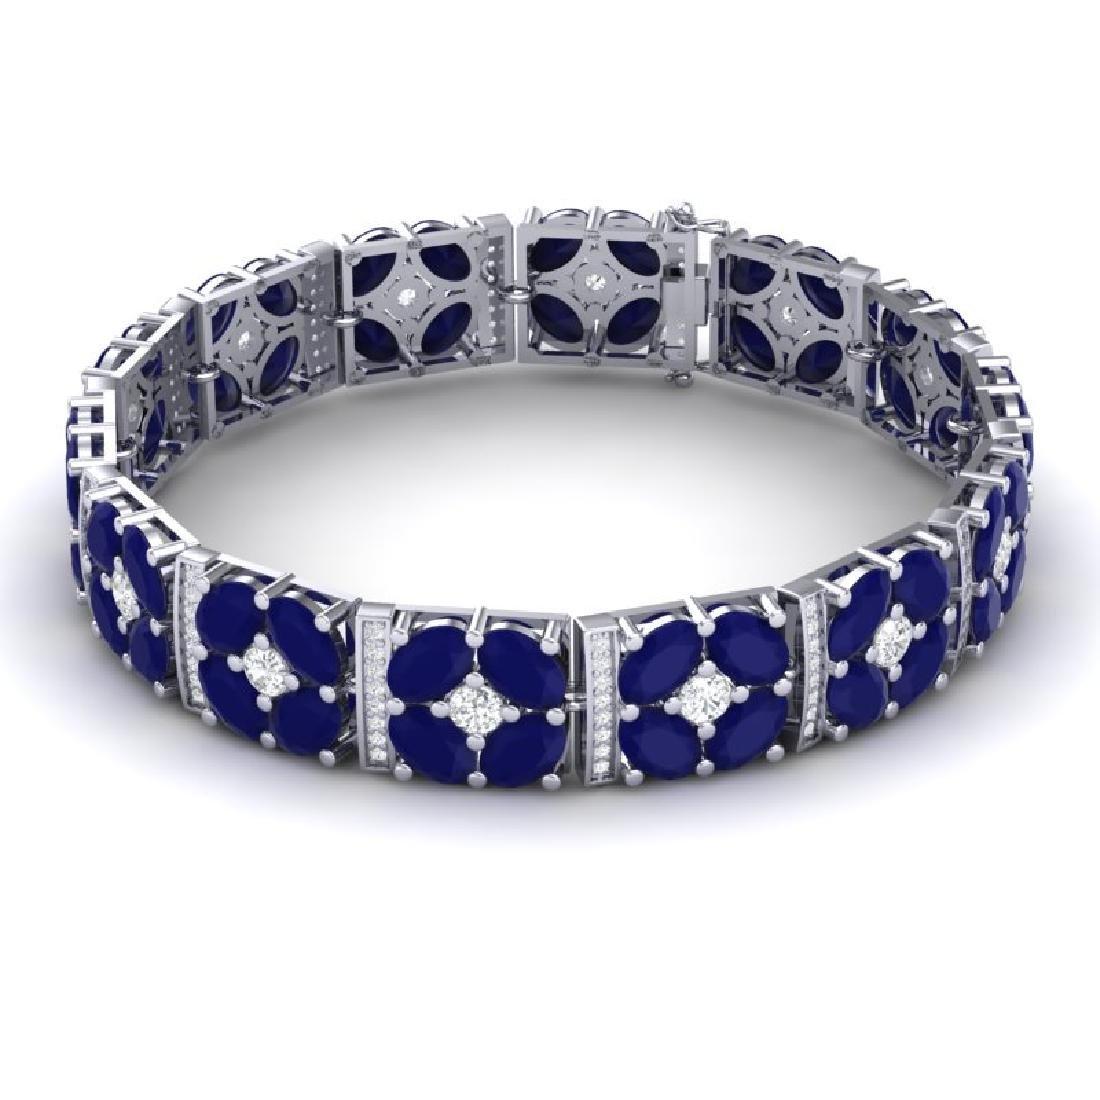 48.04 CTW Royalty Sapphire & VS Diamond Bracelet 18K - 3